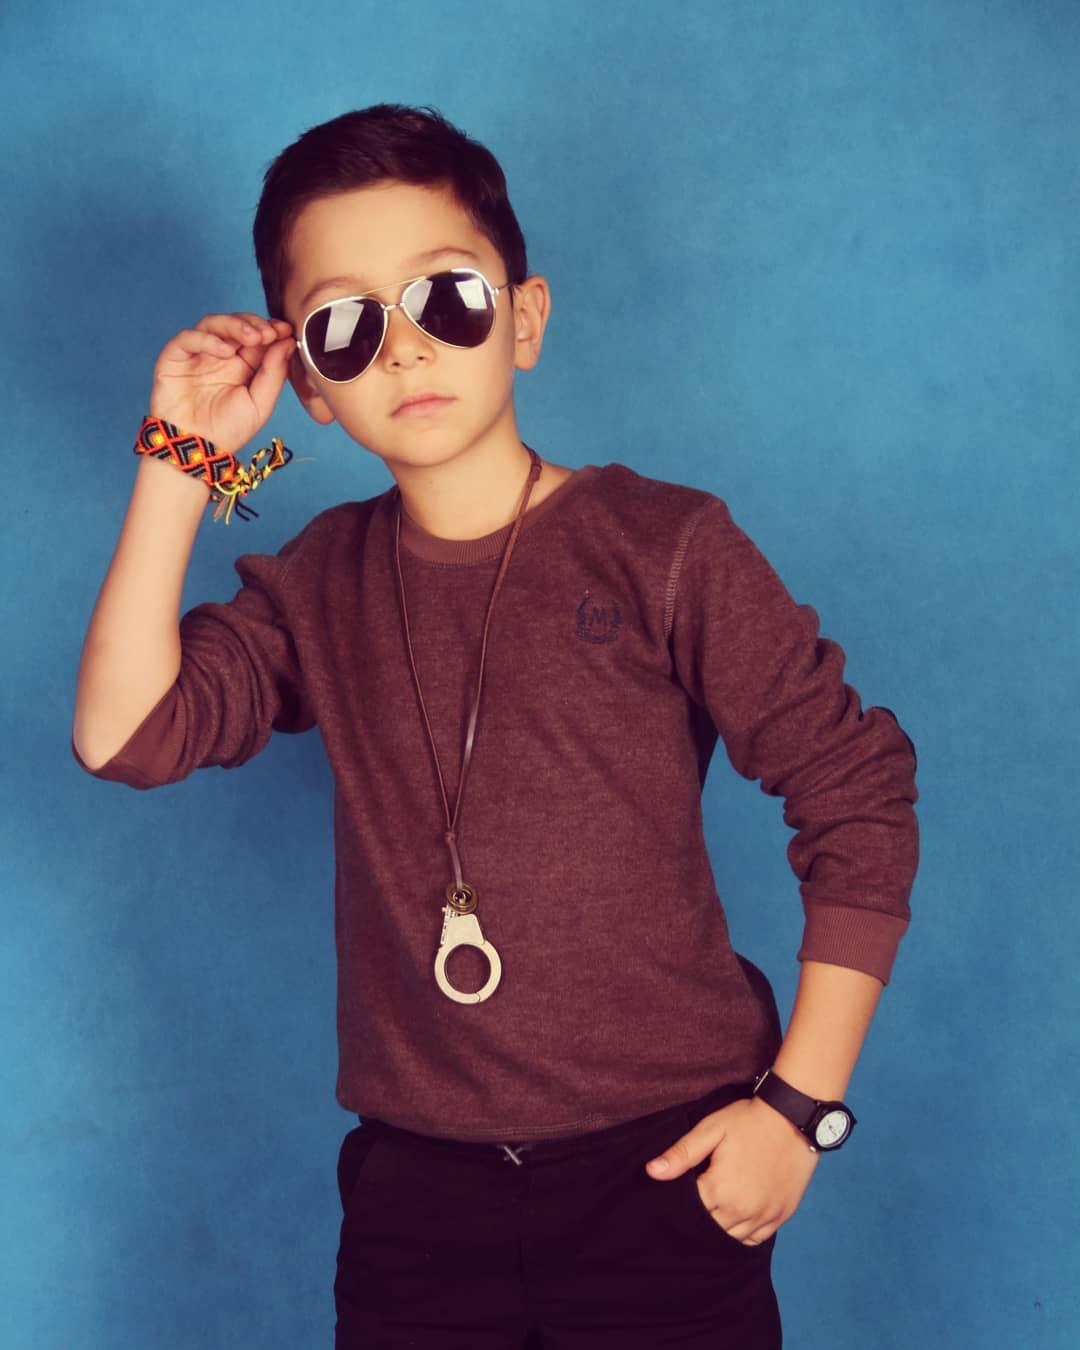 534eb574b23b Boys fashion 2019  cool fashion looks and bold trends of kids ...